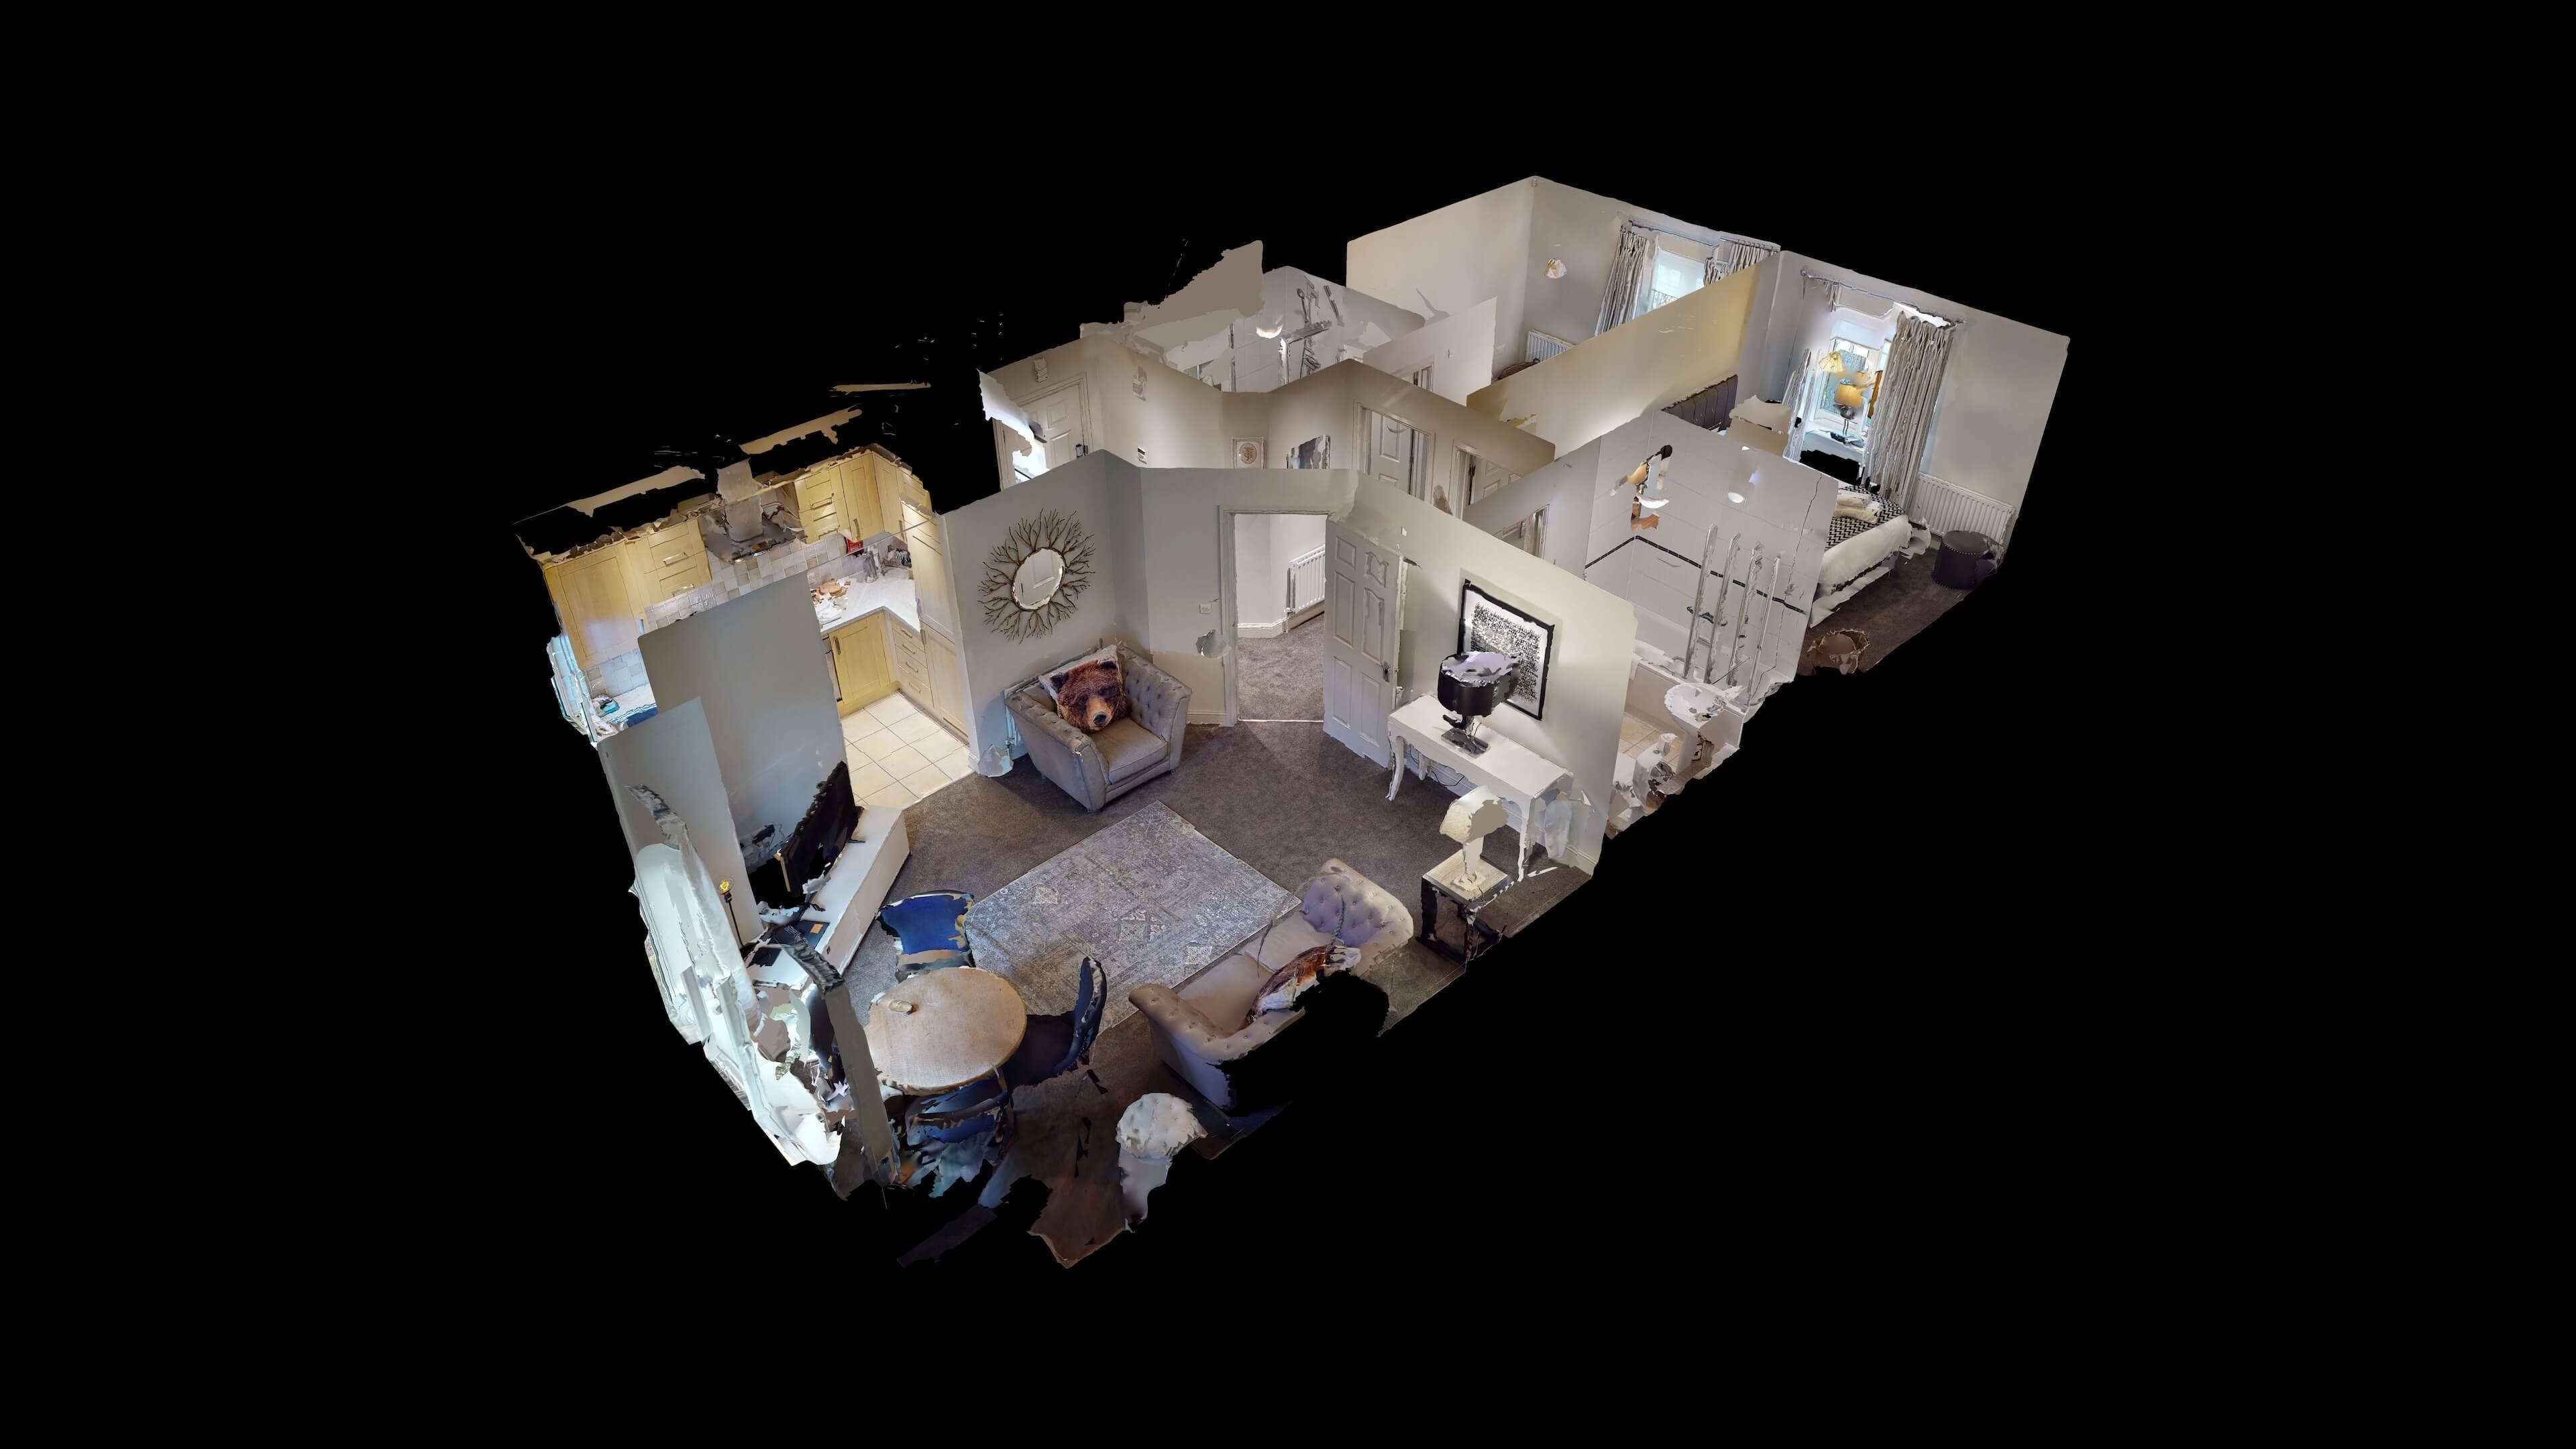 Oxford Serviced Apartment Blenheim Suite Dollhouse